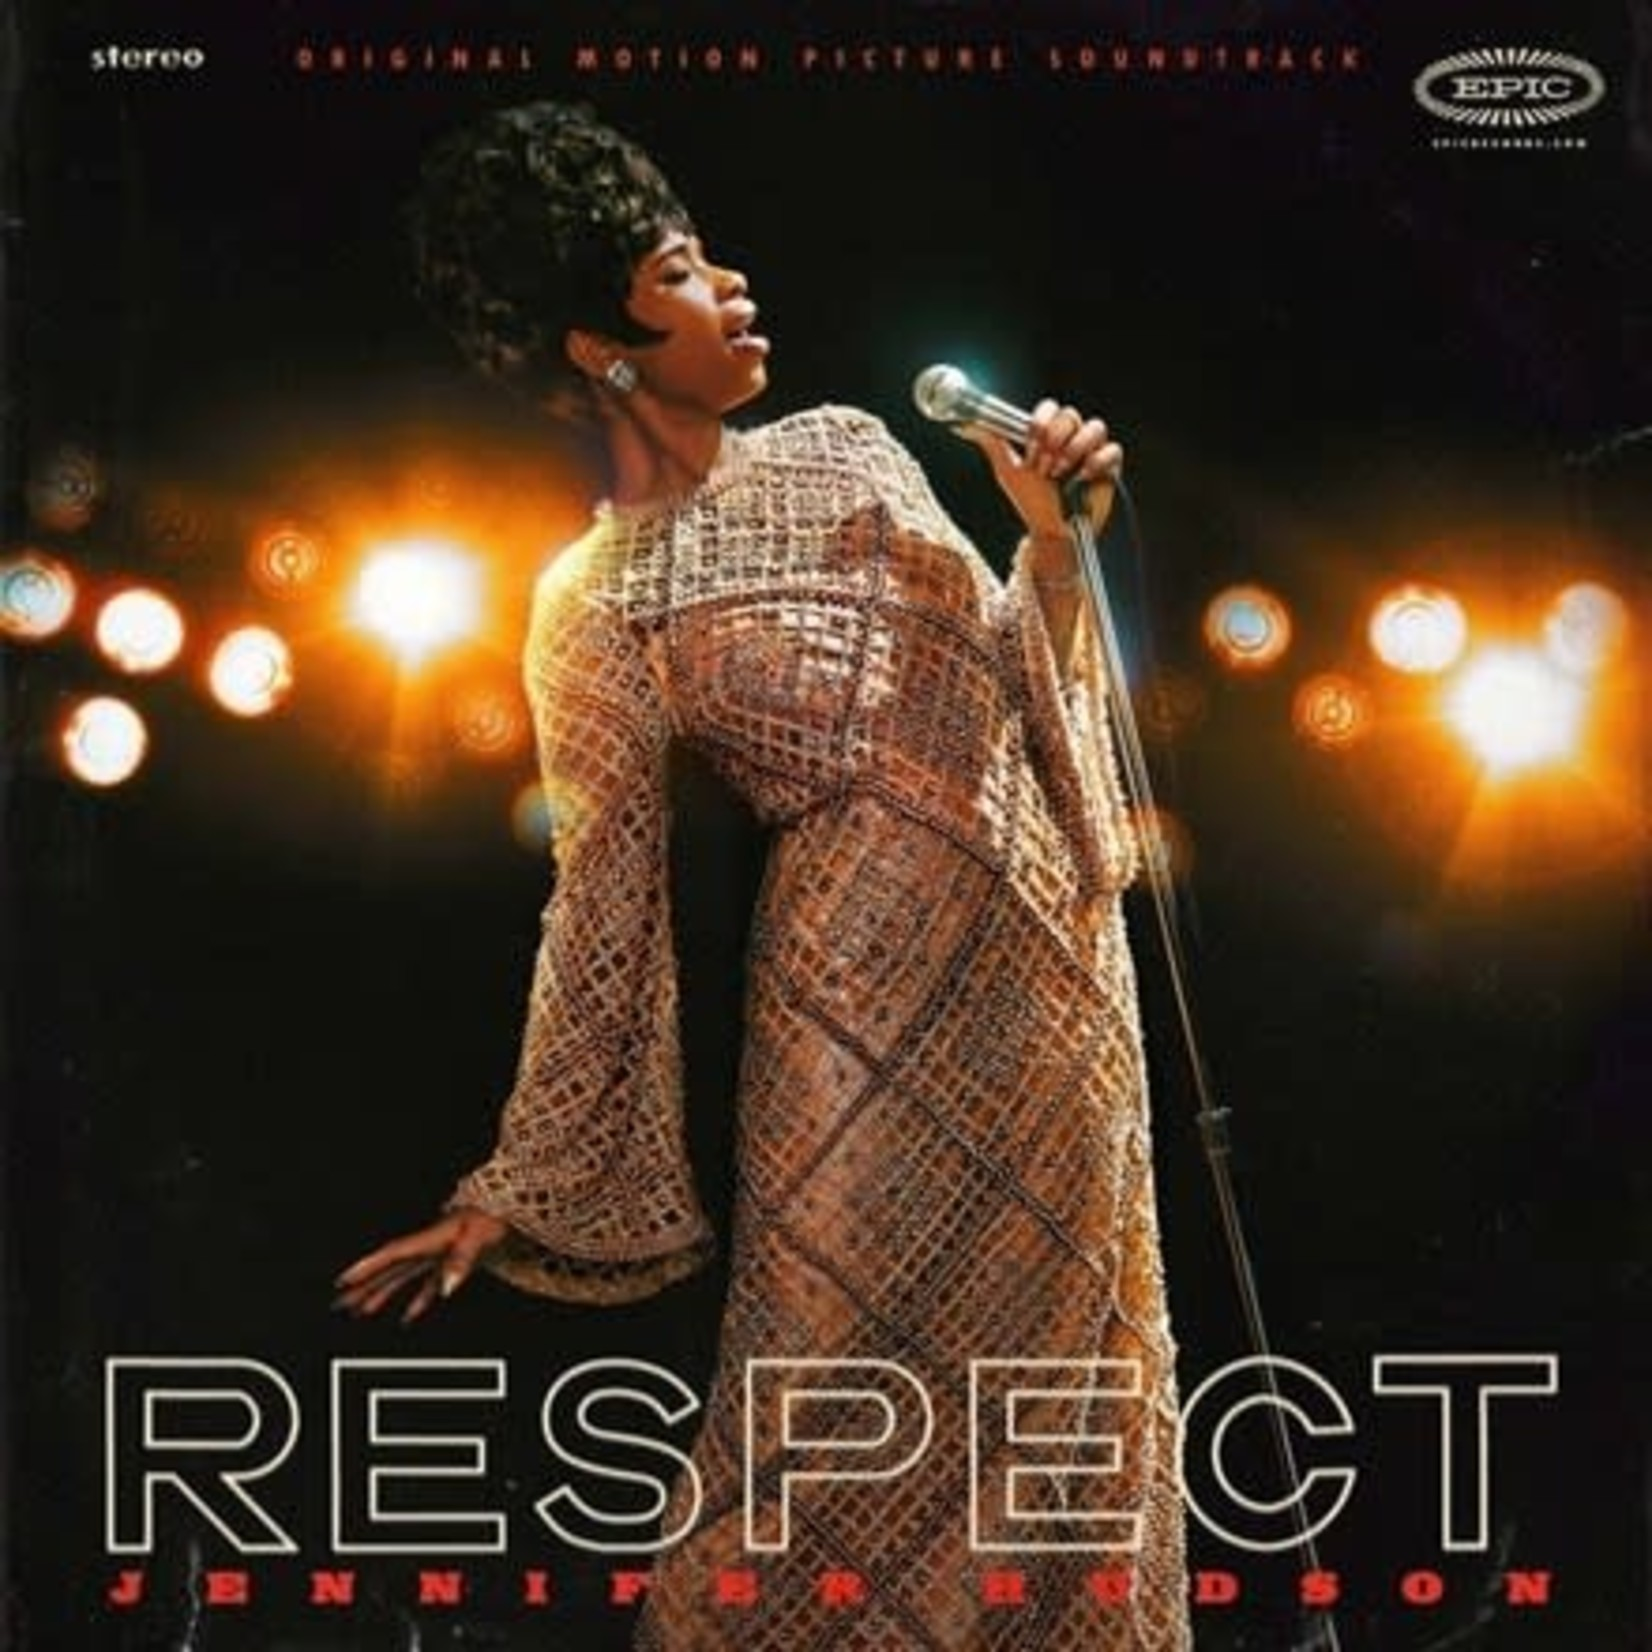 [New] soundtrack: Respect (Jennifer Hudson) (2LP) [EPIC]